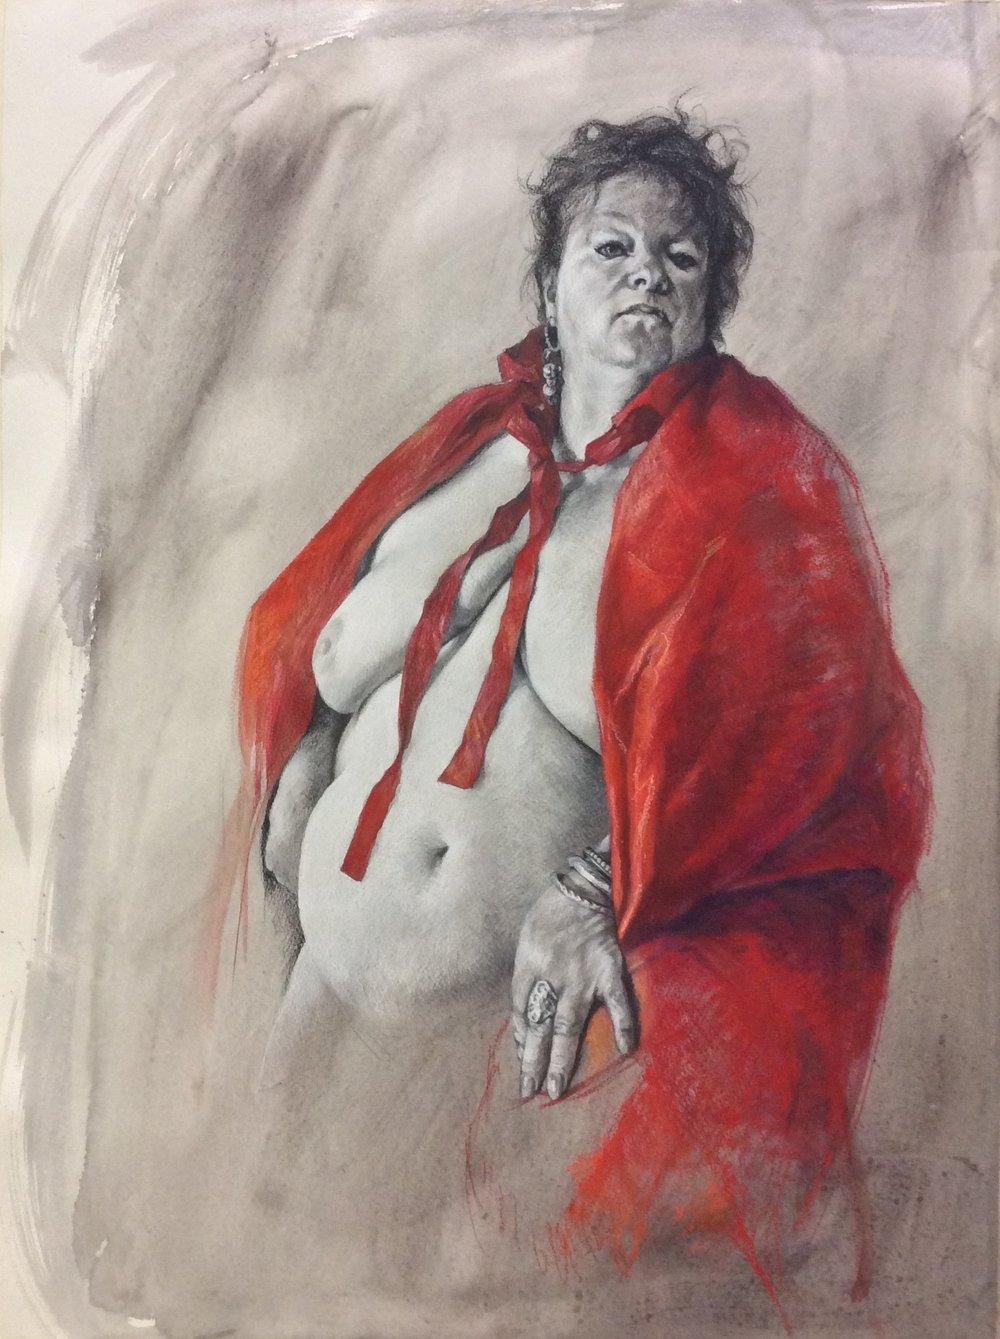 Jennifer Goddard, Bull fighter, Charcoal, pastel, watercolour on paper, height 76 cm x width 56 cm x .25 cm,  http://www.jgoddardartist.com